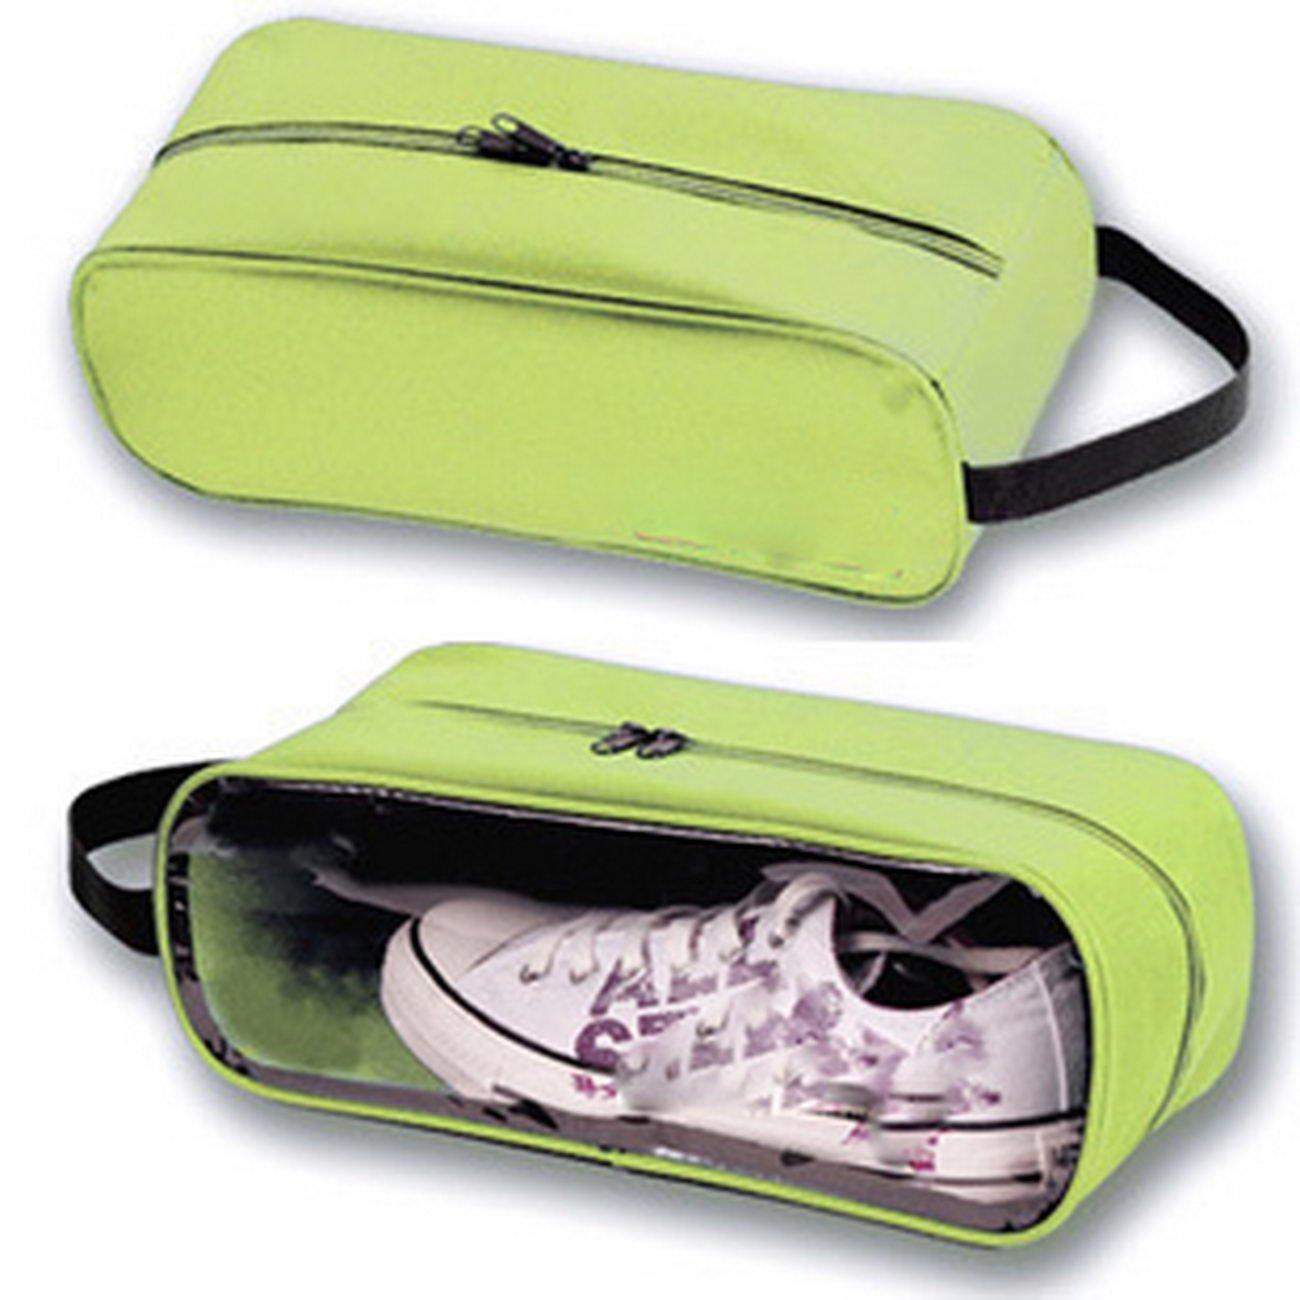 liuxiyux31liwx8 X Outdoors、旅行、クリアビジュアル化、ストレージ、バッグ、靴、バッグ、靴カバー、スポーツ旅行靴、バッグ、防水靴カバー。Visualポーチ靴バッグ、靴、ポーチ、シューズポーチ B078M6CPYY  グラスグリーン